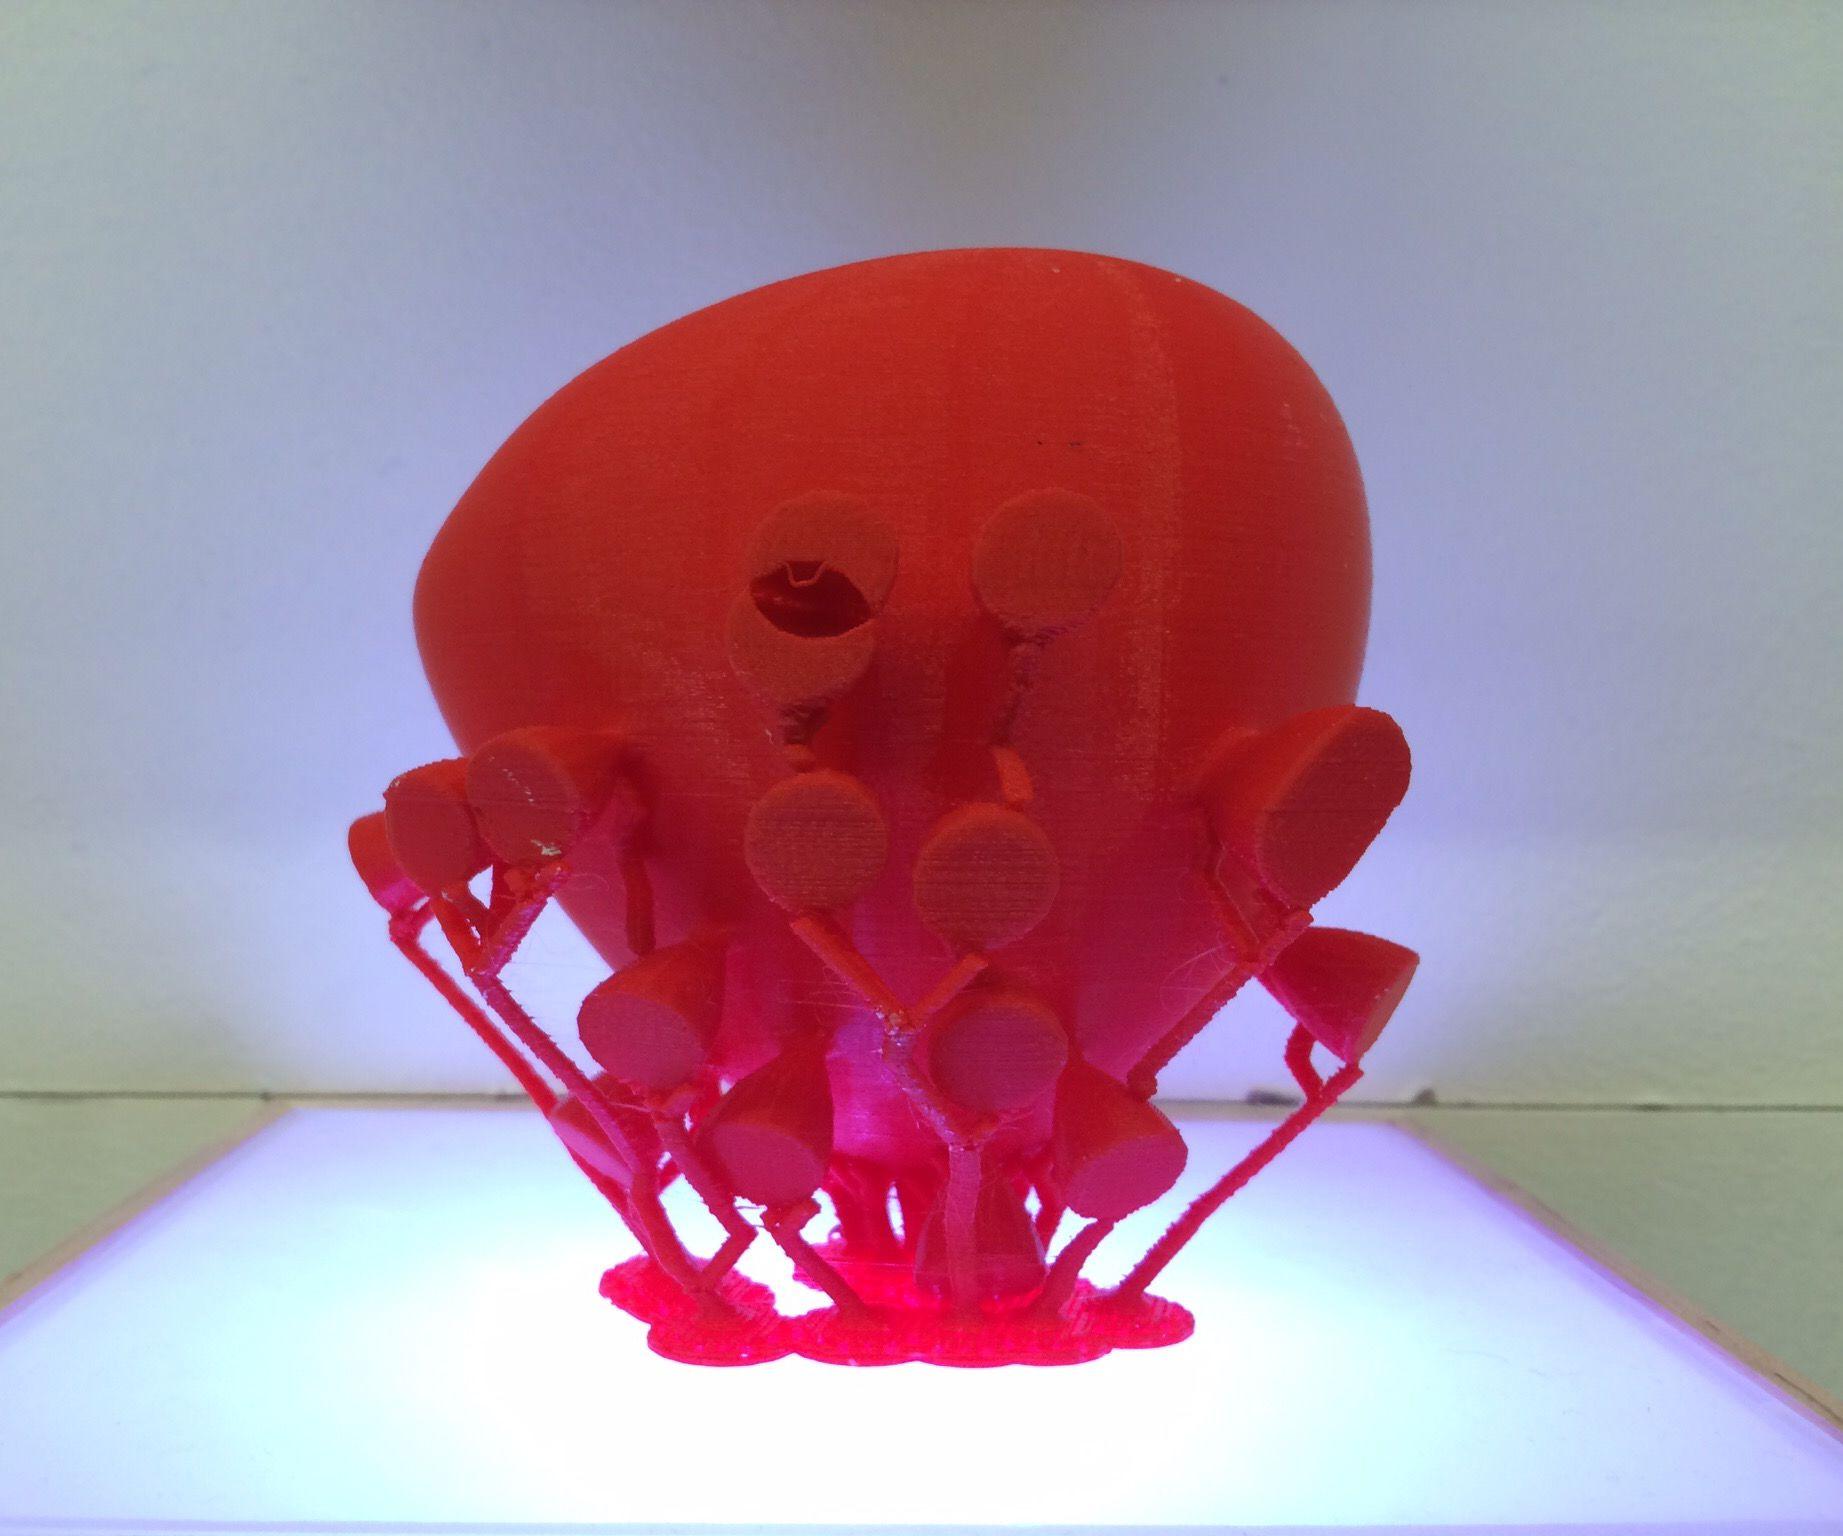 3D print with complex overhangs